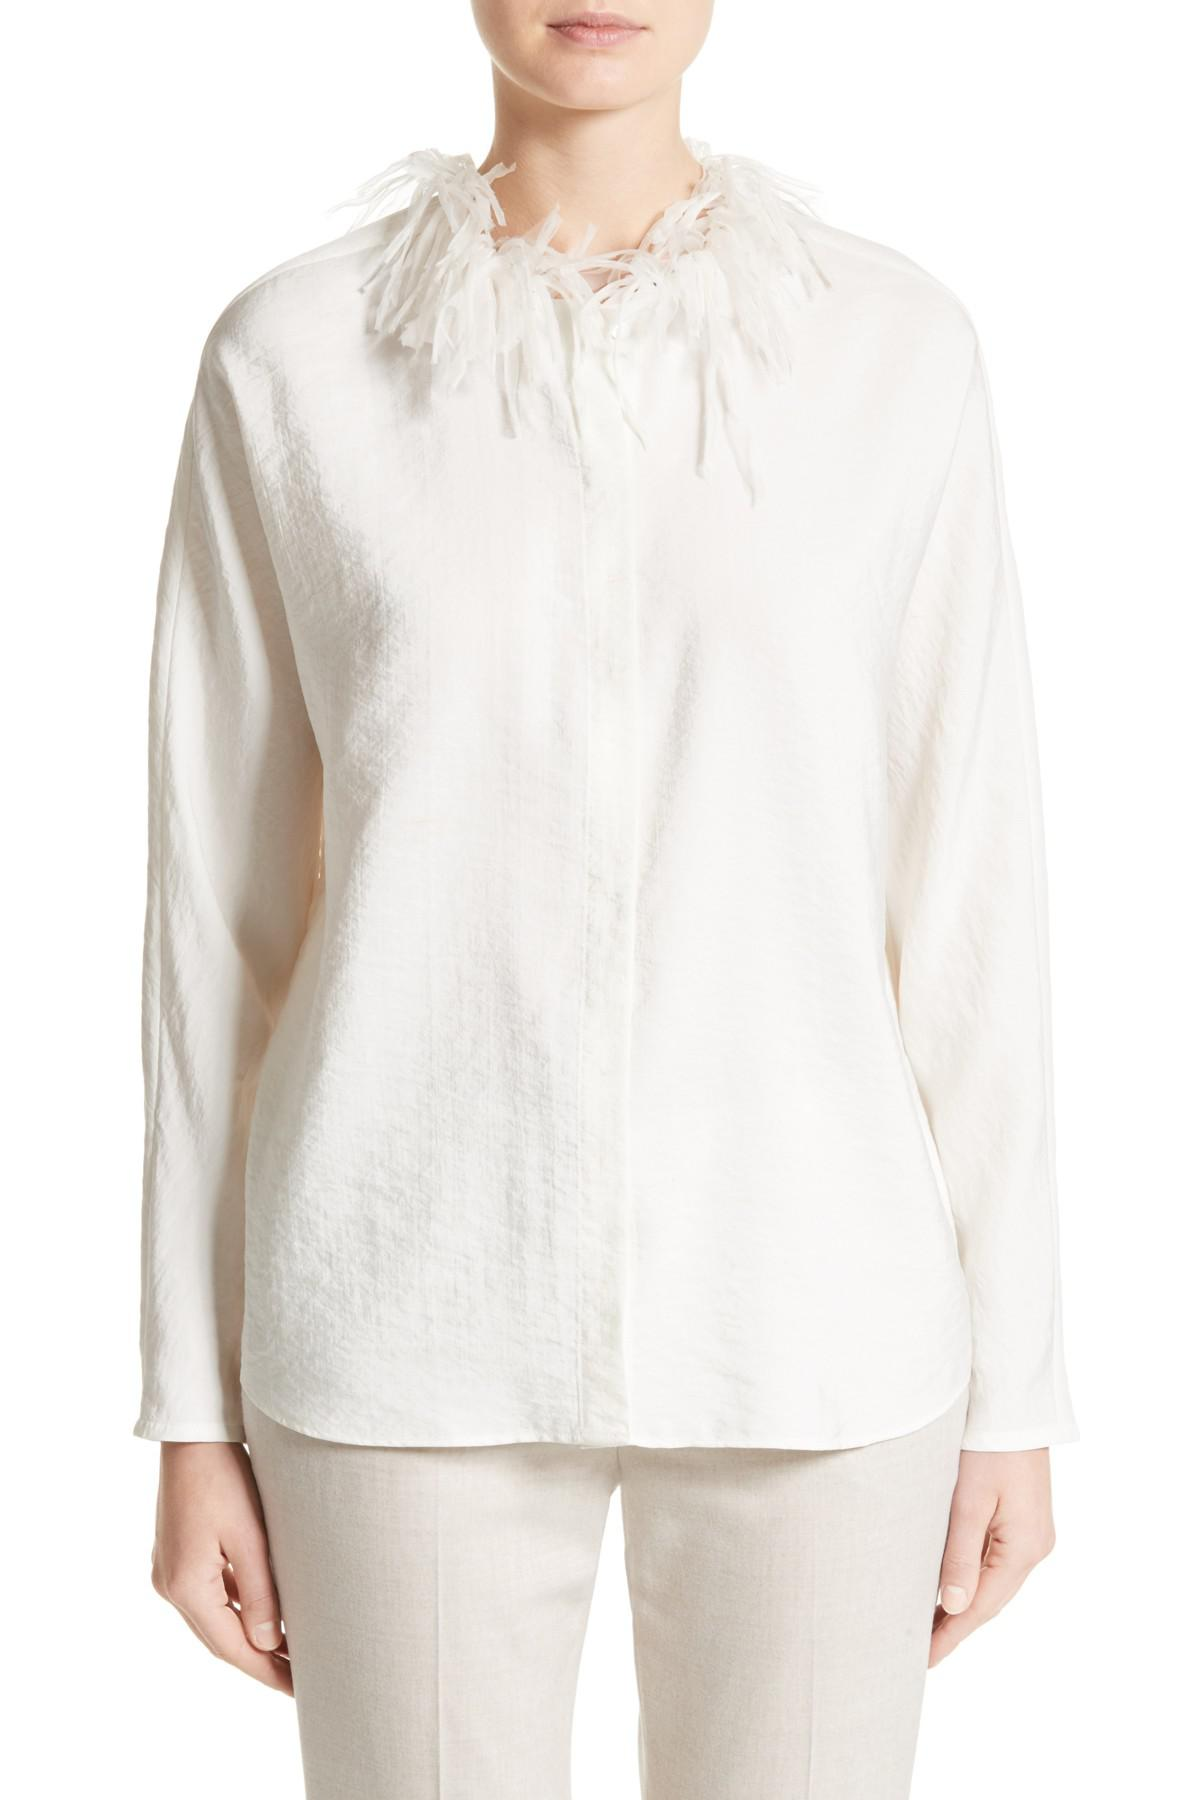 6e7a757f1a6b3 Lyst - Fabiana Filippi Silk Blend Twill Blouse With Organza Collar ...